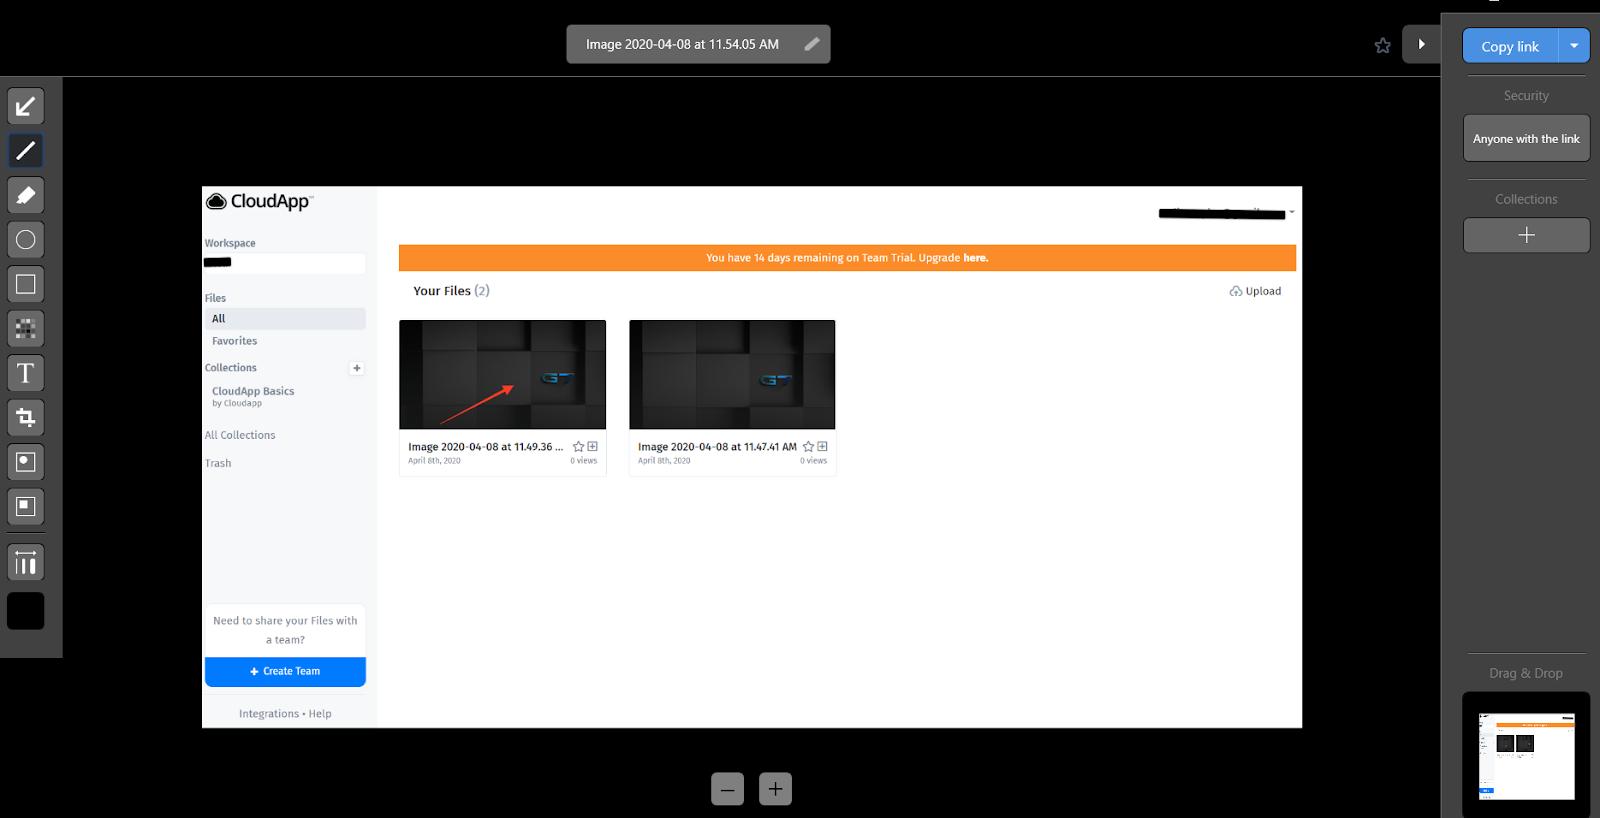 cloudapp screenshot sharing